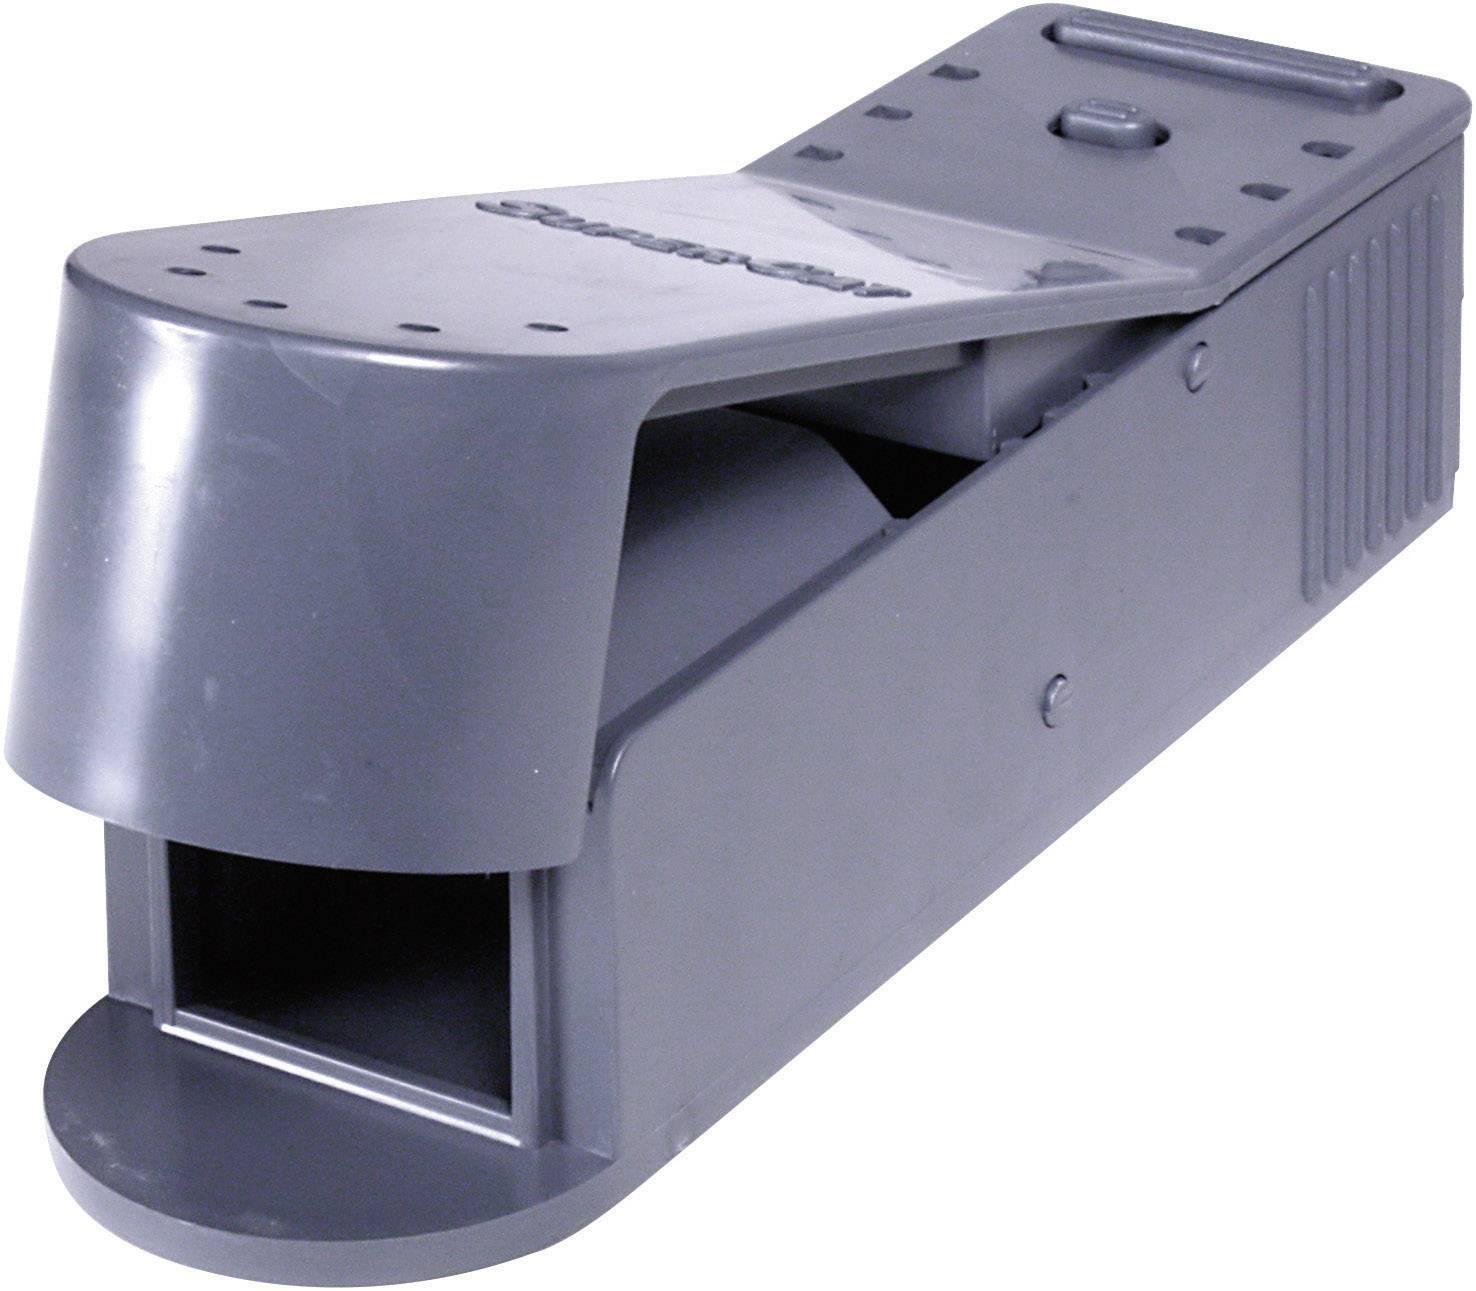 Swissinno SuperCat Mousehouse 1 083 035